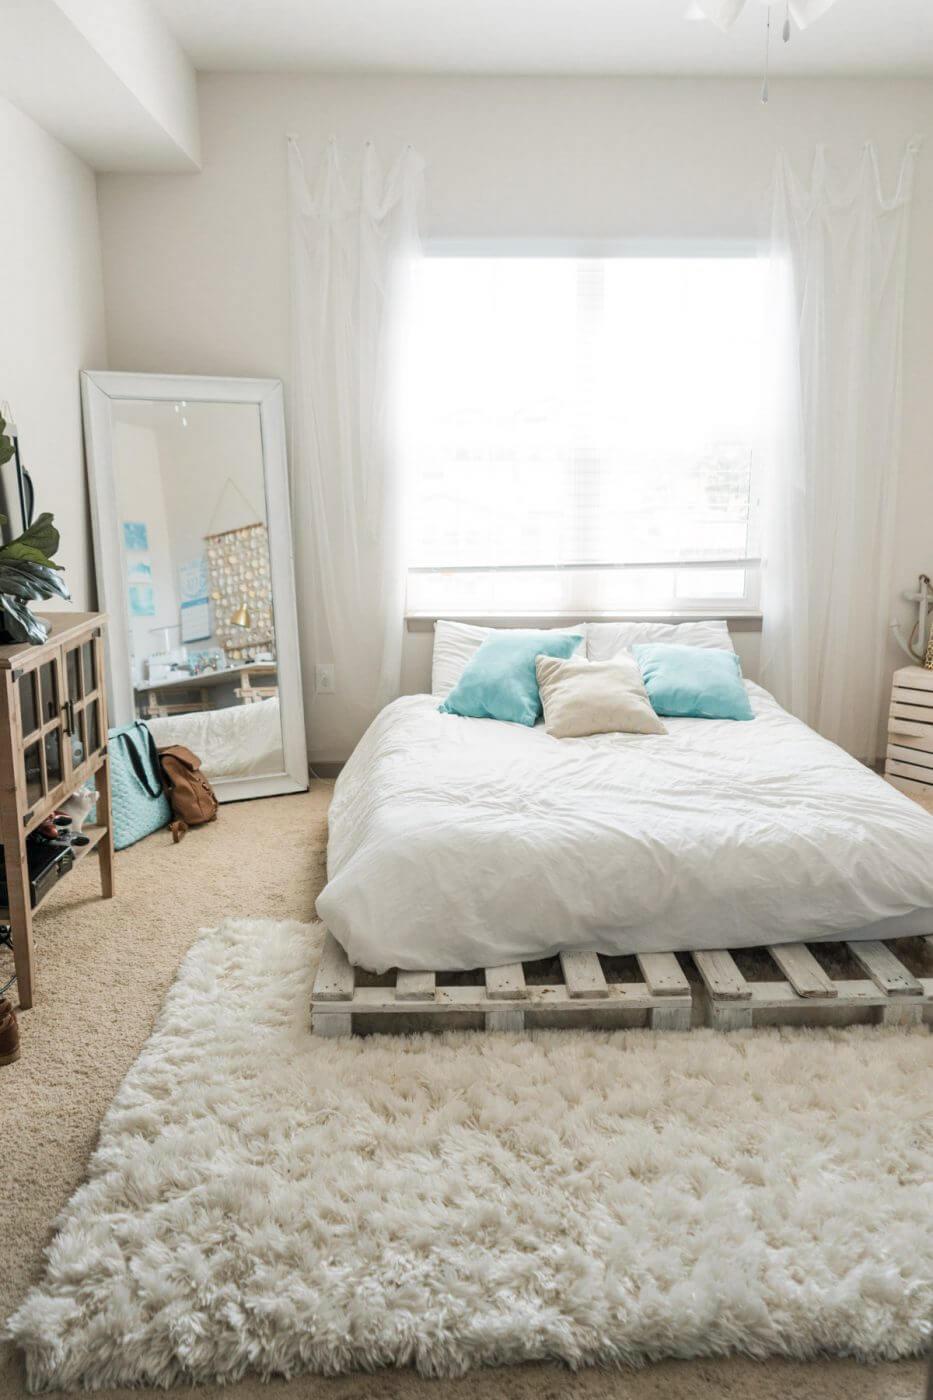 20 Best DIY Pallet Bed Frame Ideas to Update Your Bedroom ... on Pallet Bedroom  id=14533